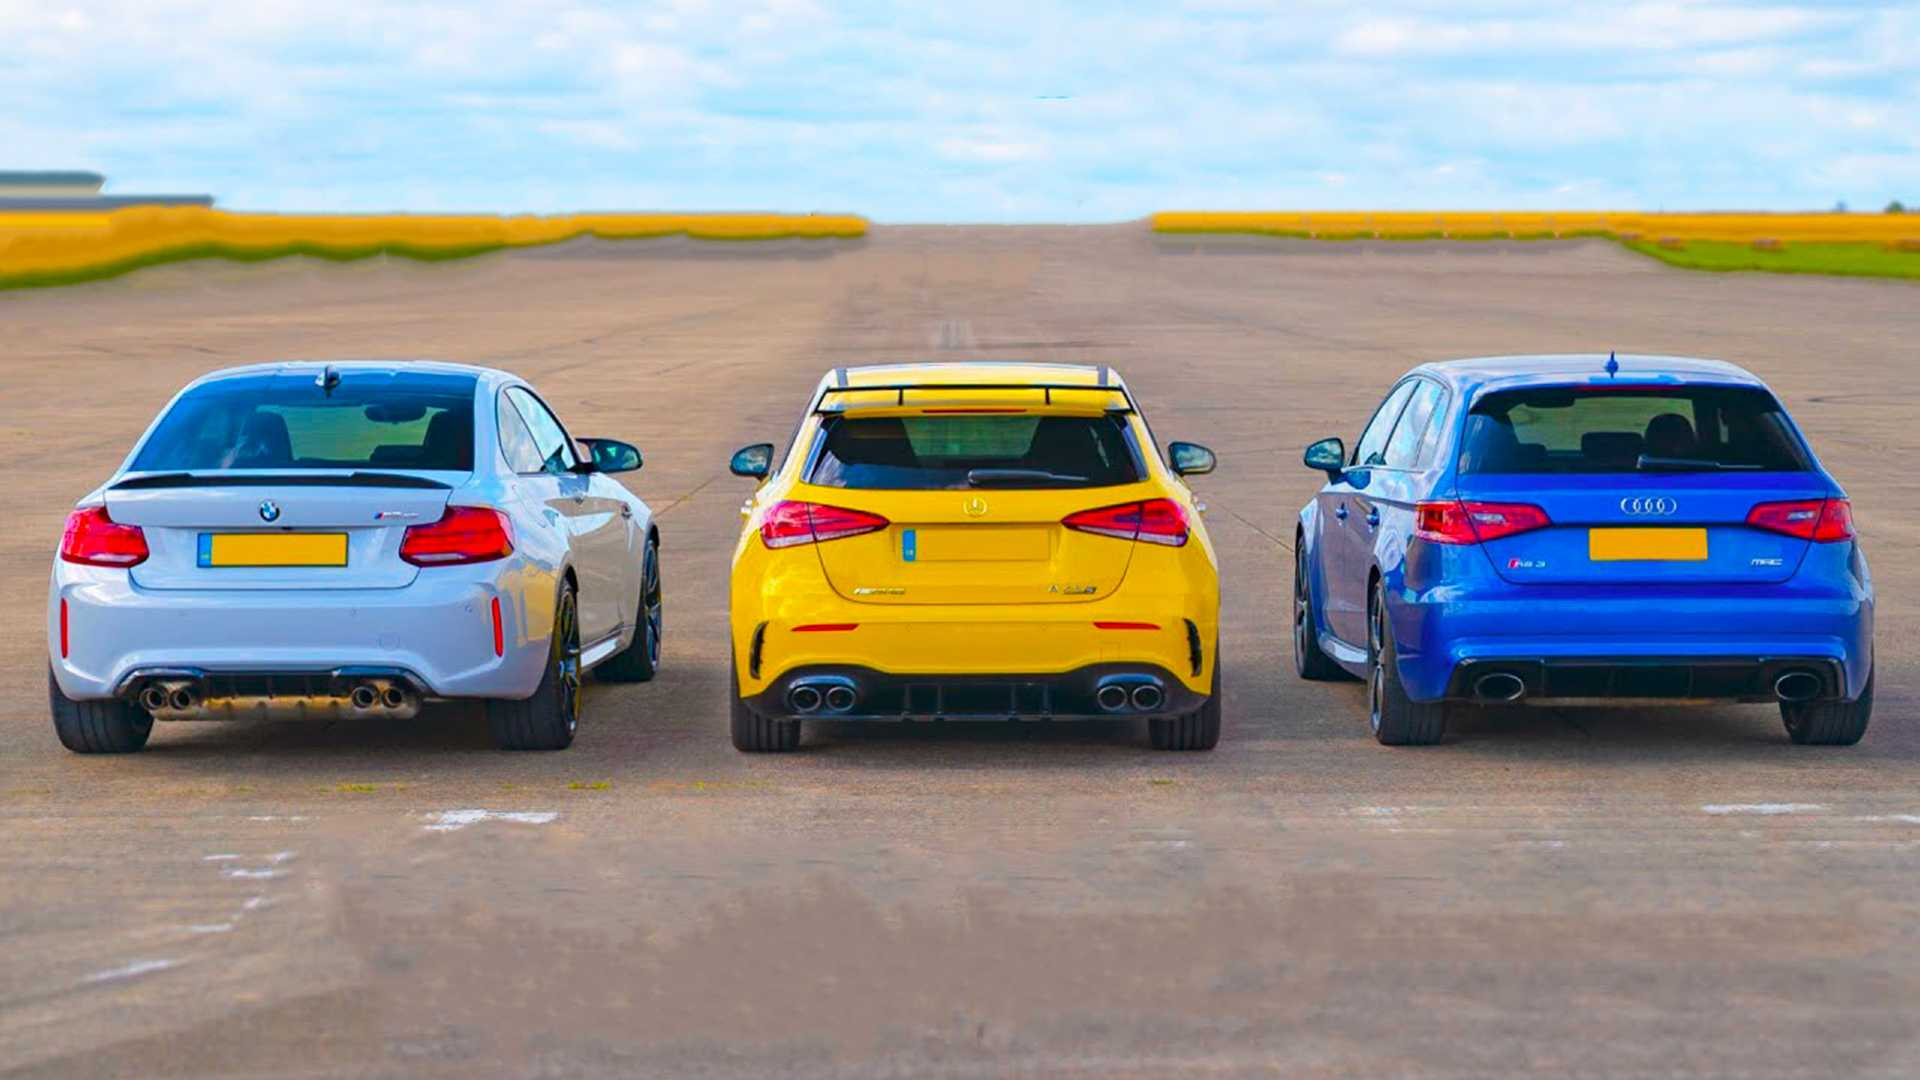 Od lewej: BMW M2 CS, Mercedes-AMG A45 S, Audi RS3